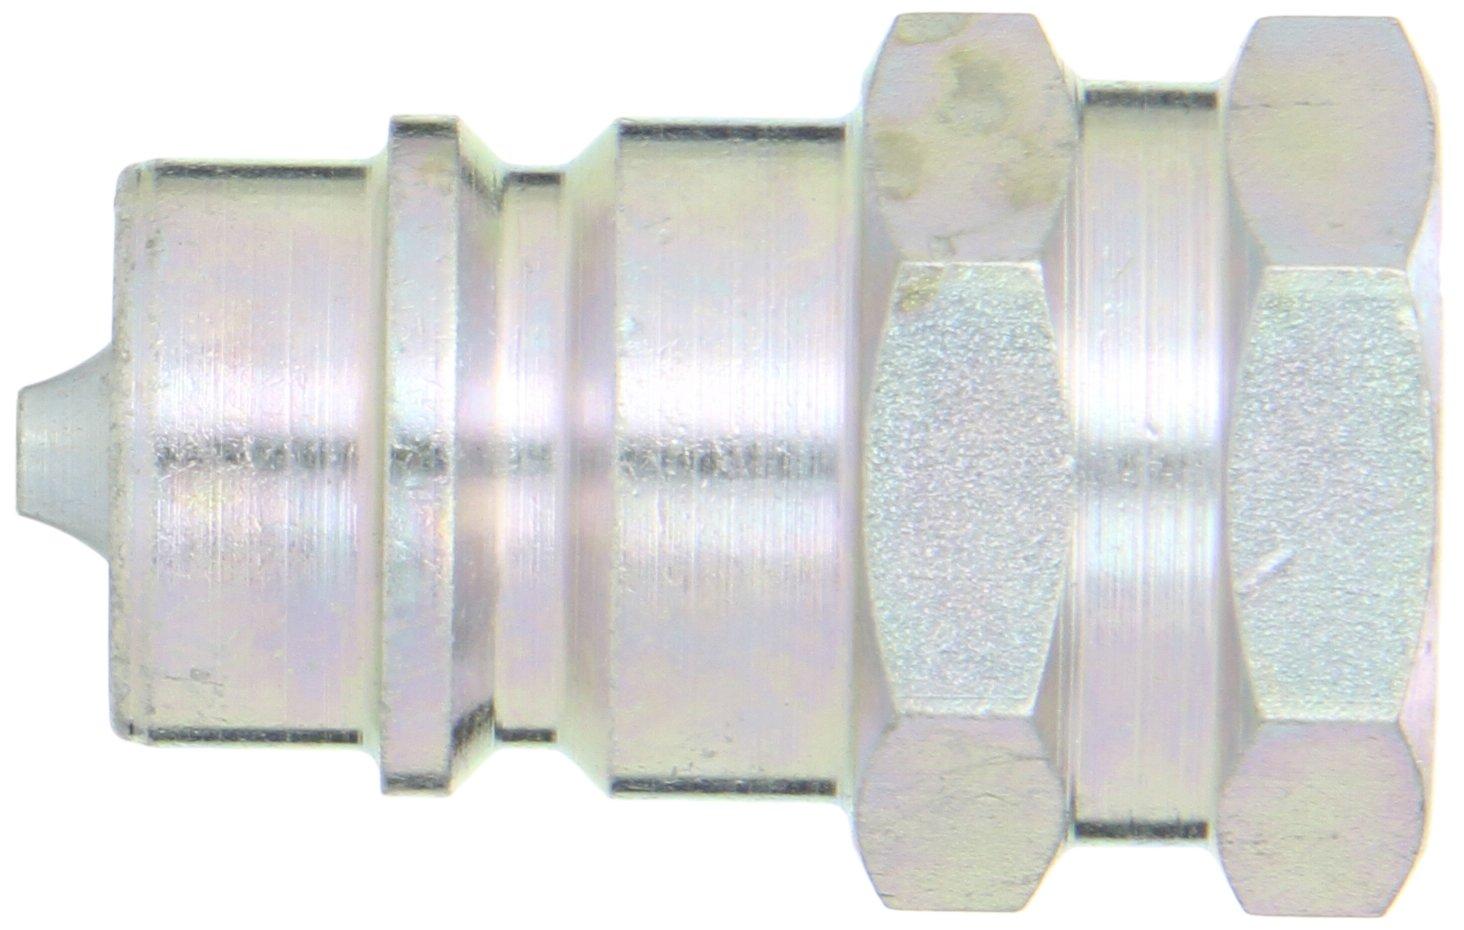 Dixon Valve K4F4 Steel ISO-A Interchange Hydraulic Fitting, Nipple, 1/2'' Coupling x 1/2'' - 14 NPTF Female Thread by Dixon Valve & Coupling (Image #2)